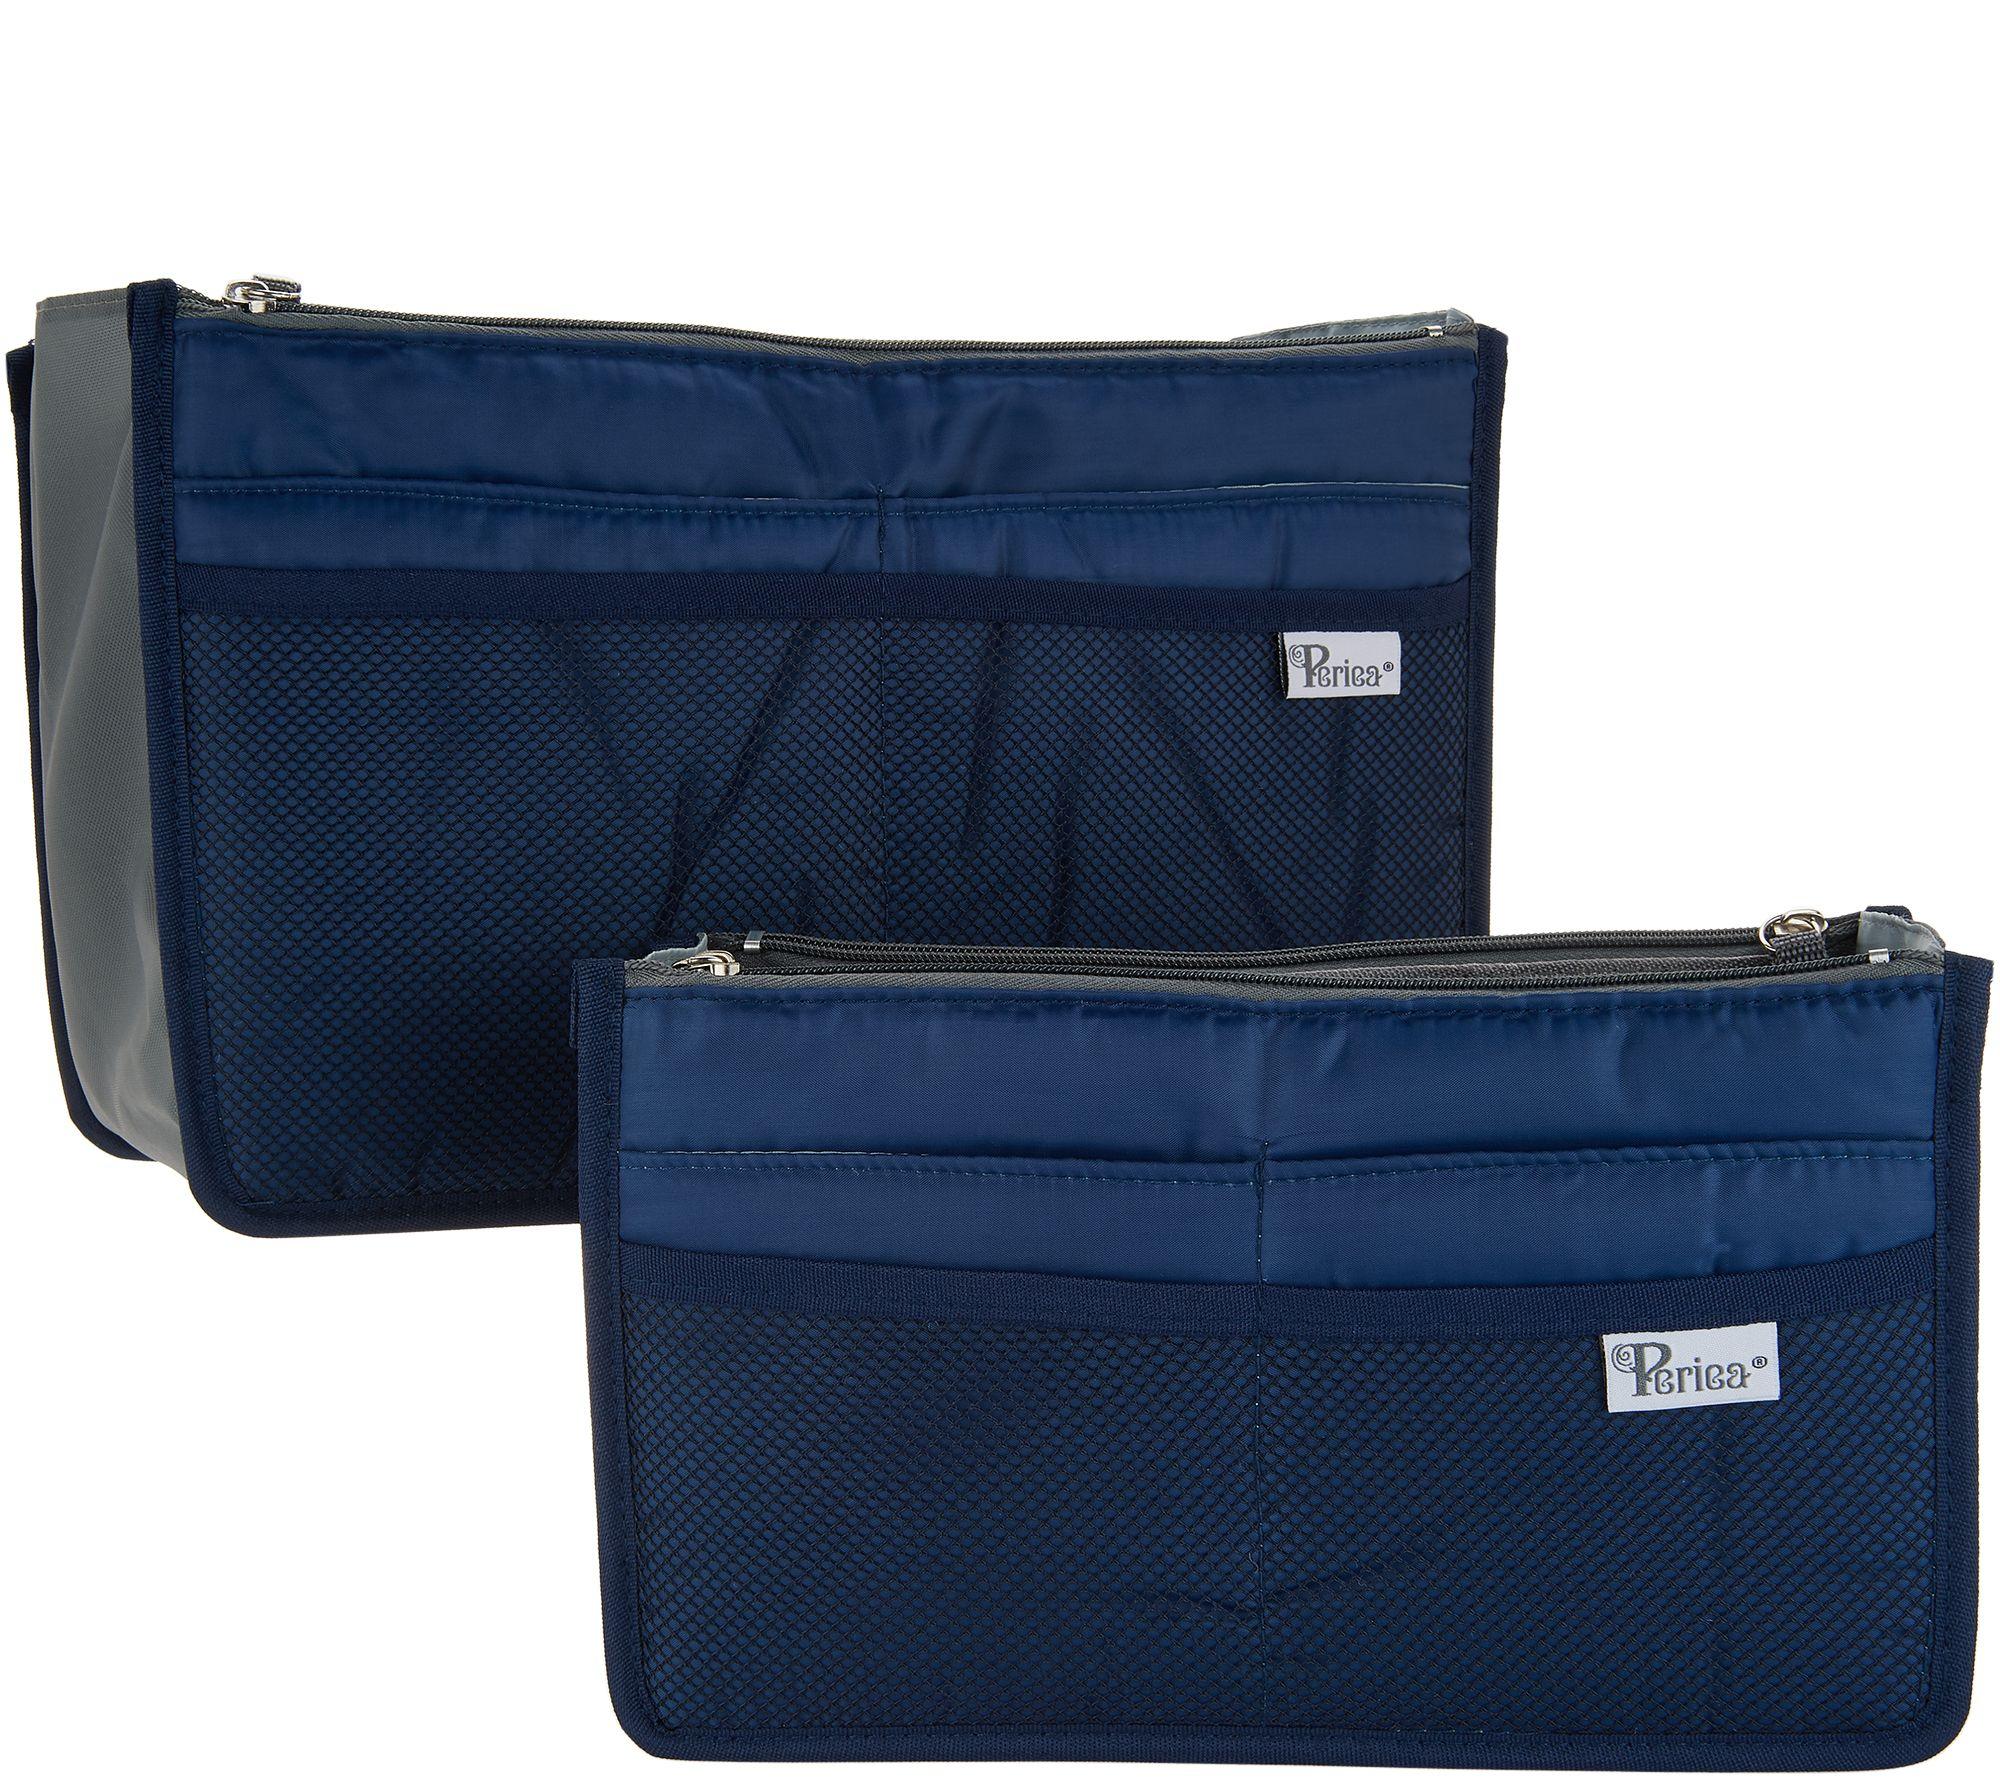 7d9a8638d387 Periea Set of 2 Premium Handbag Organizer with Pockets Med   Large - Page 1  — QVC.com